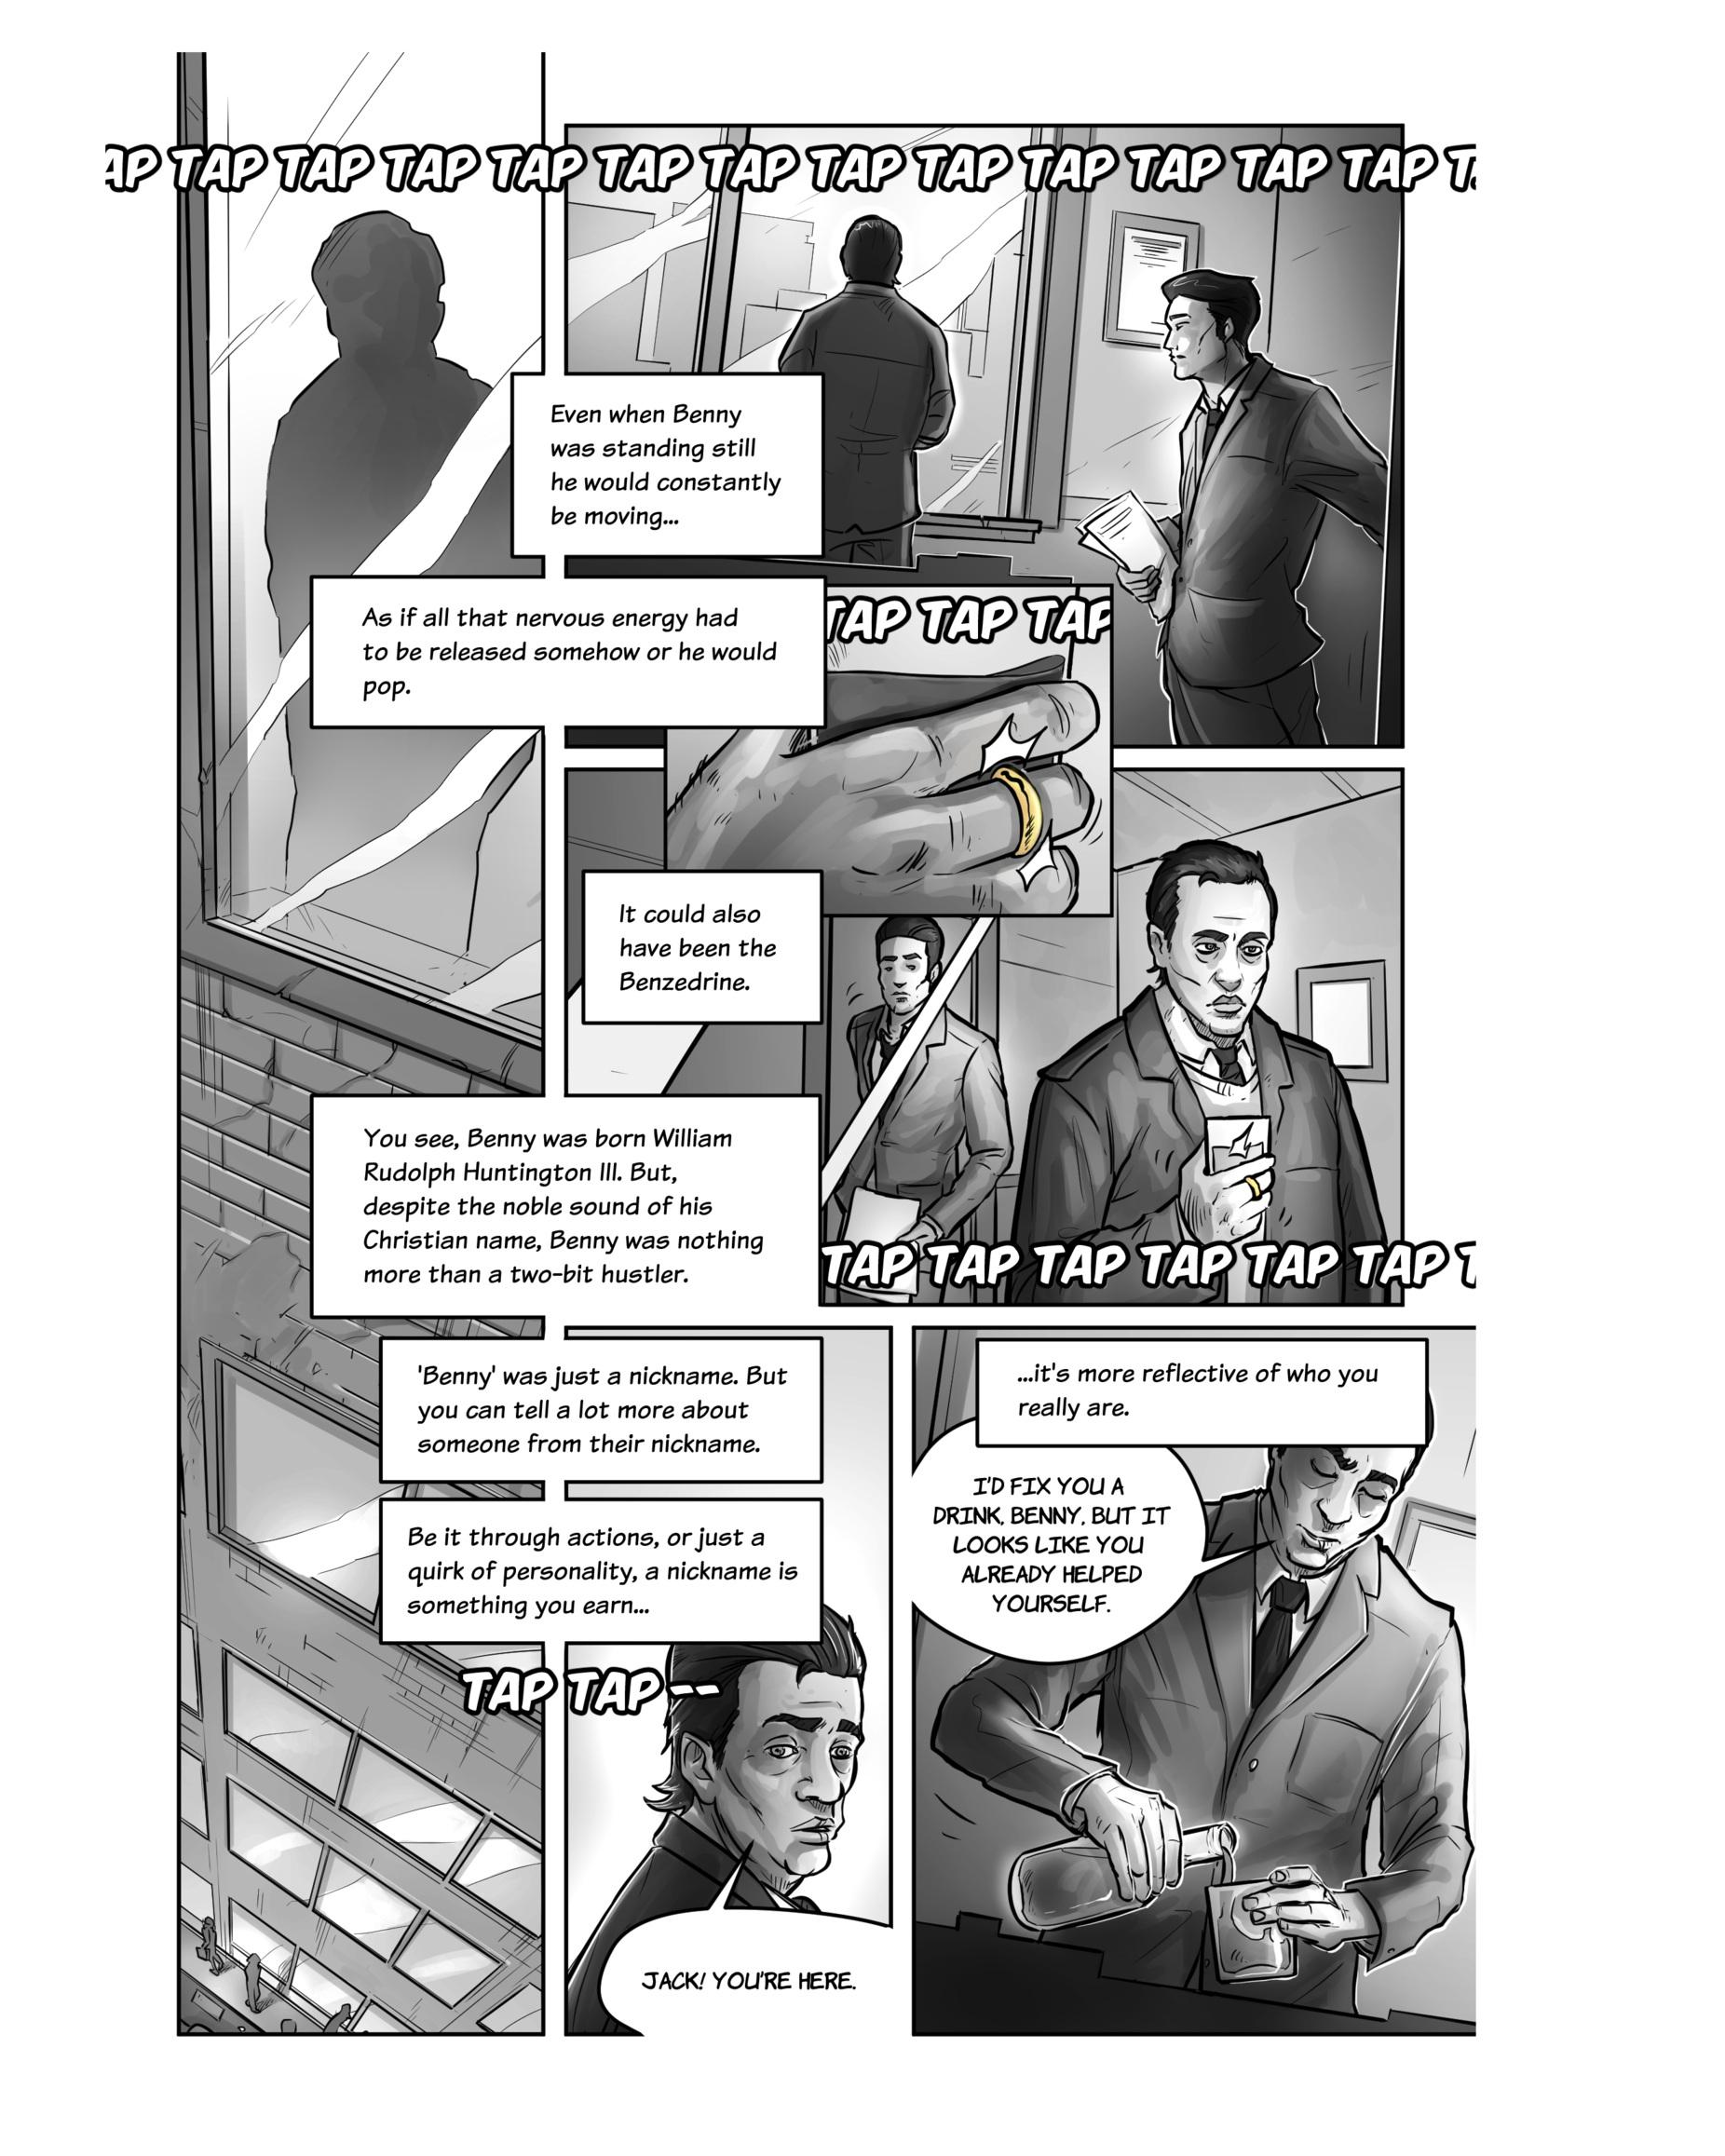 owatw_1+PAGE+12+WEB.jpg